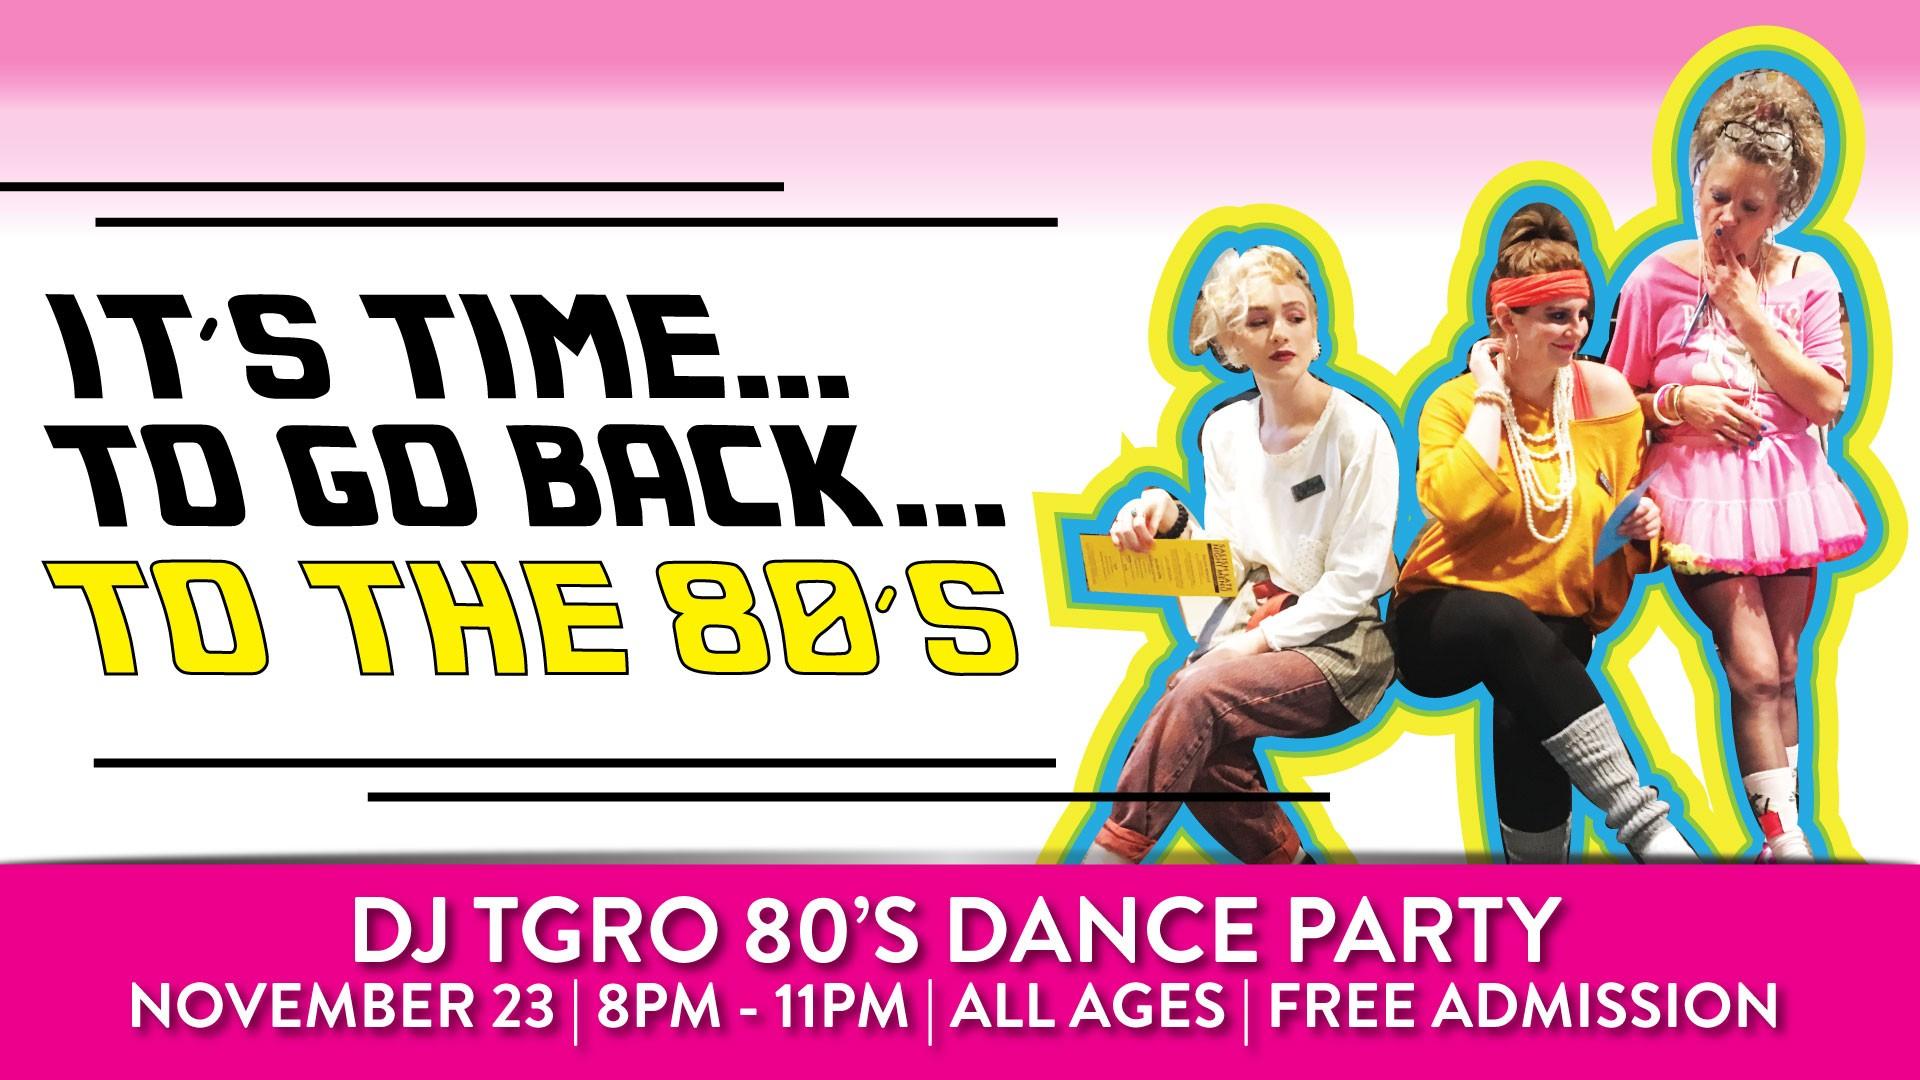 DJ TGRO 80s Dance Party